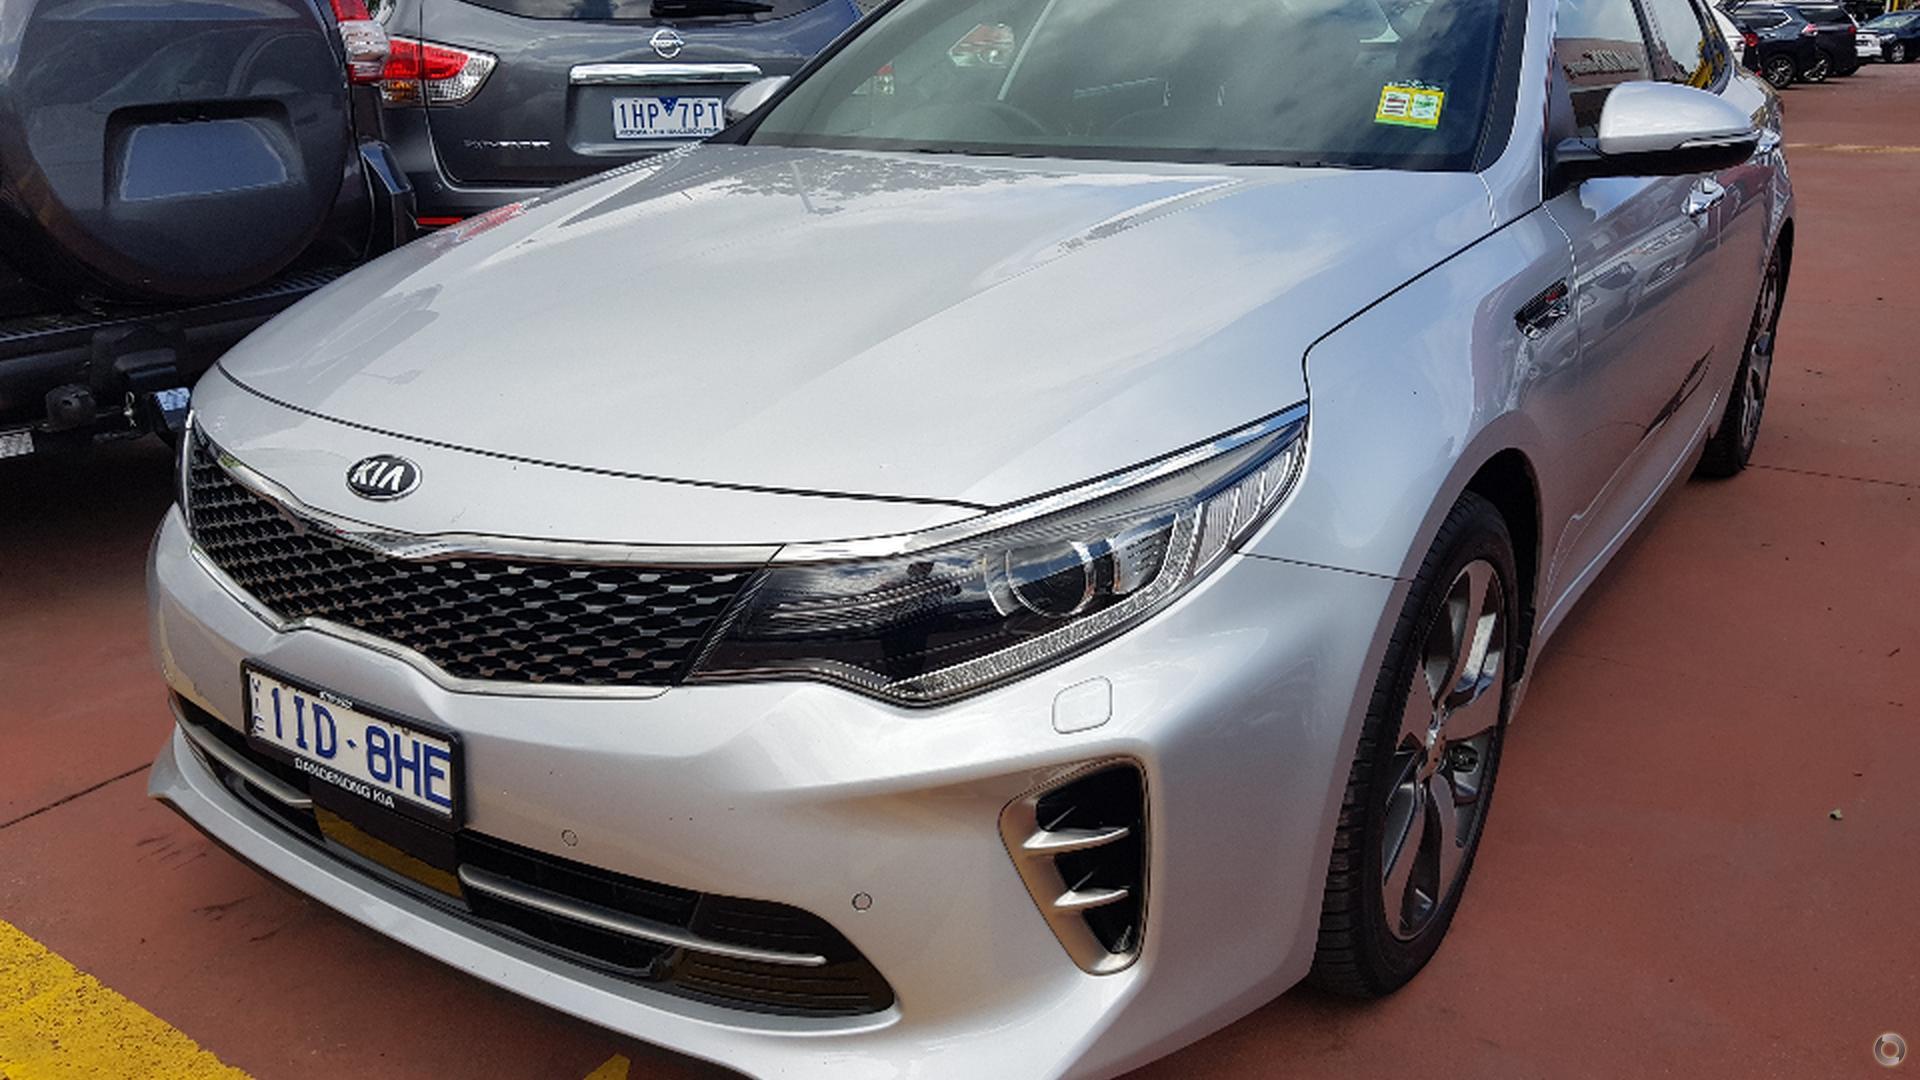 2015 Kia Optima GT JF